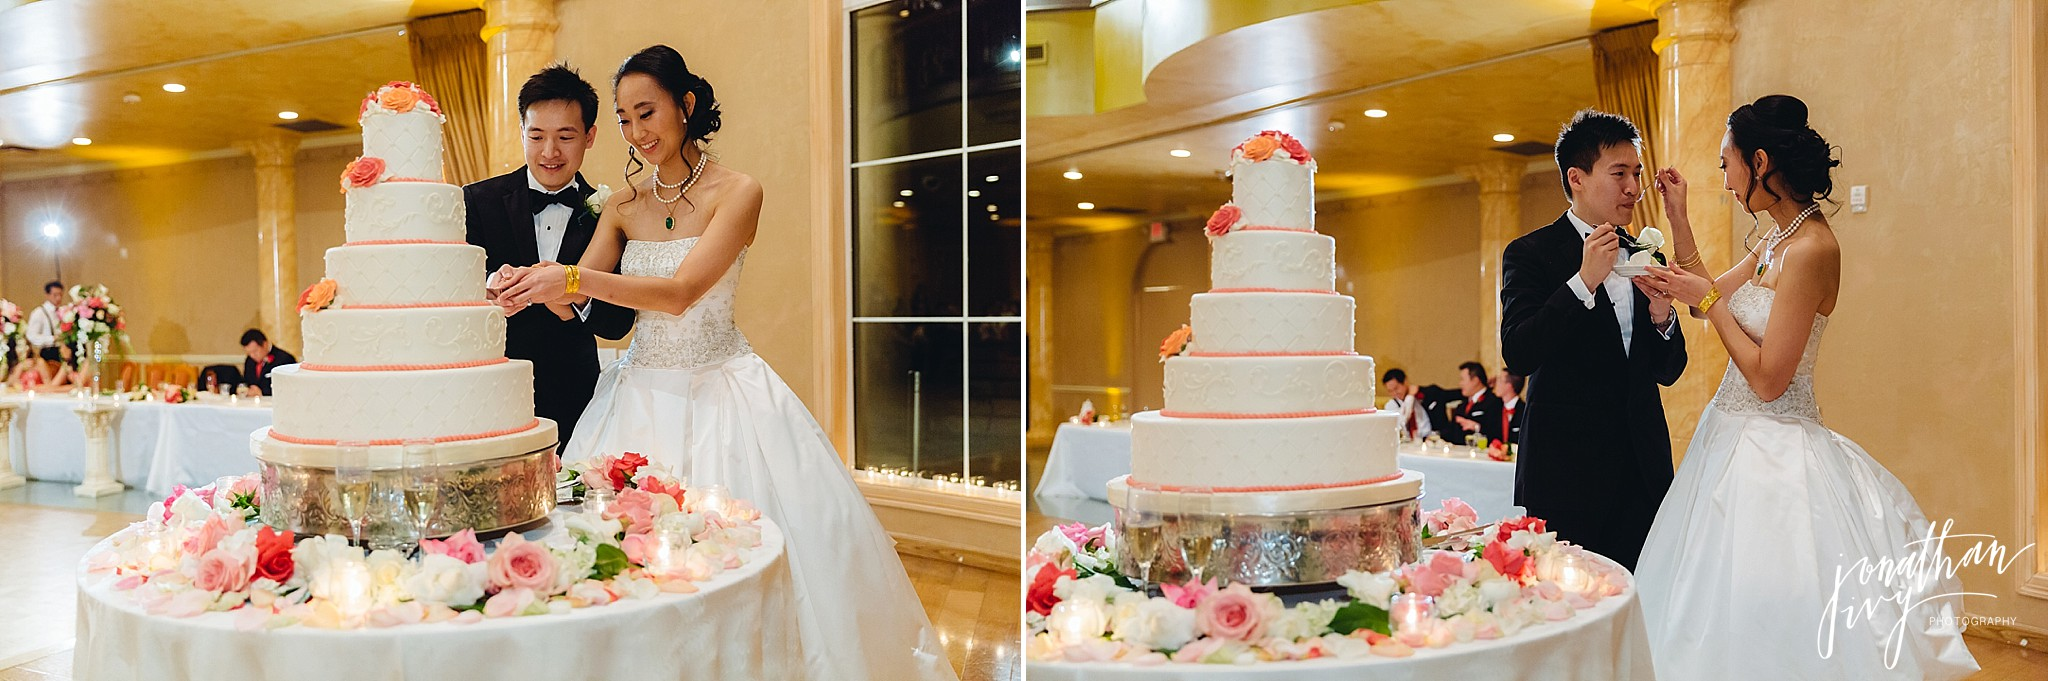 Chateau-Polonez-Wedding-Houston_0036.jpg